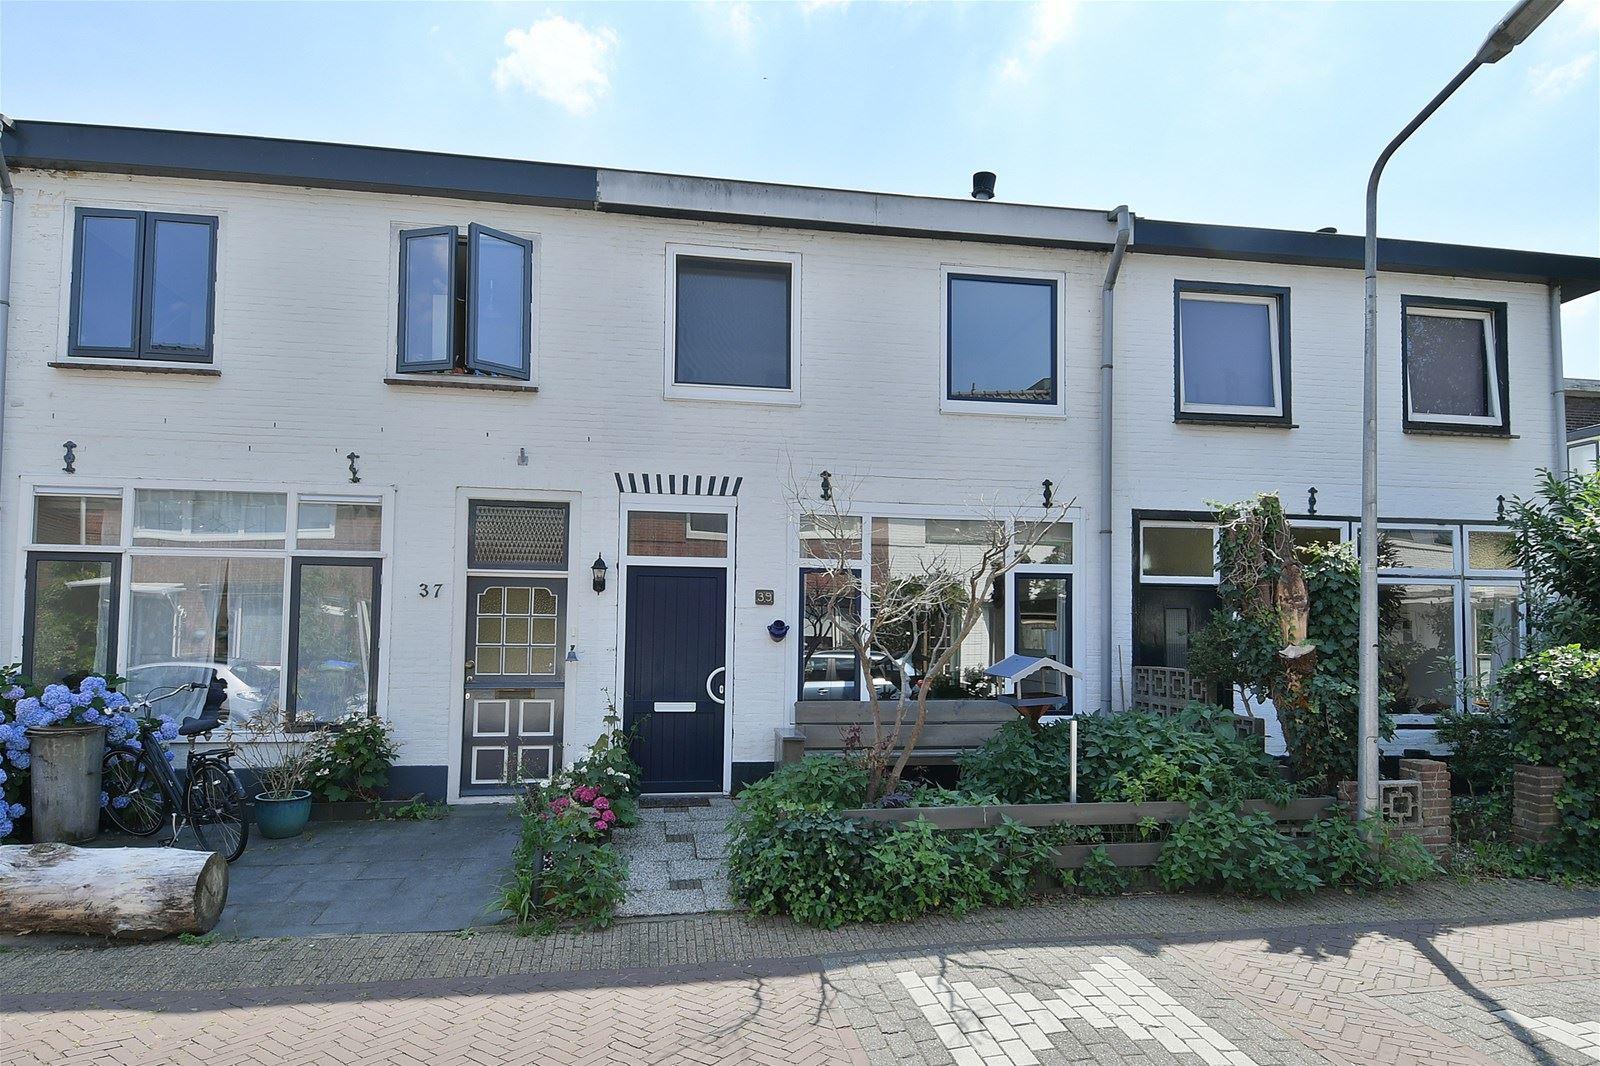 Huis te koop 2e nieuwstraat 39 1211 jv hilversum funda for Huis hilversum